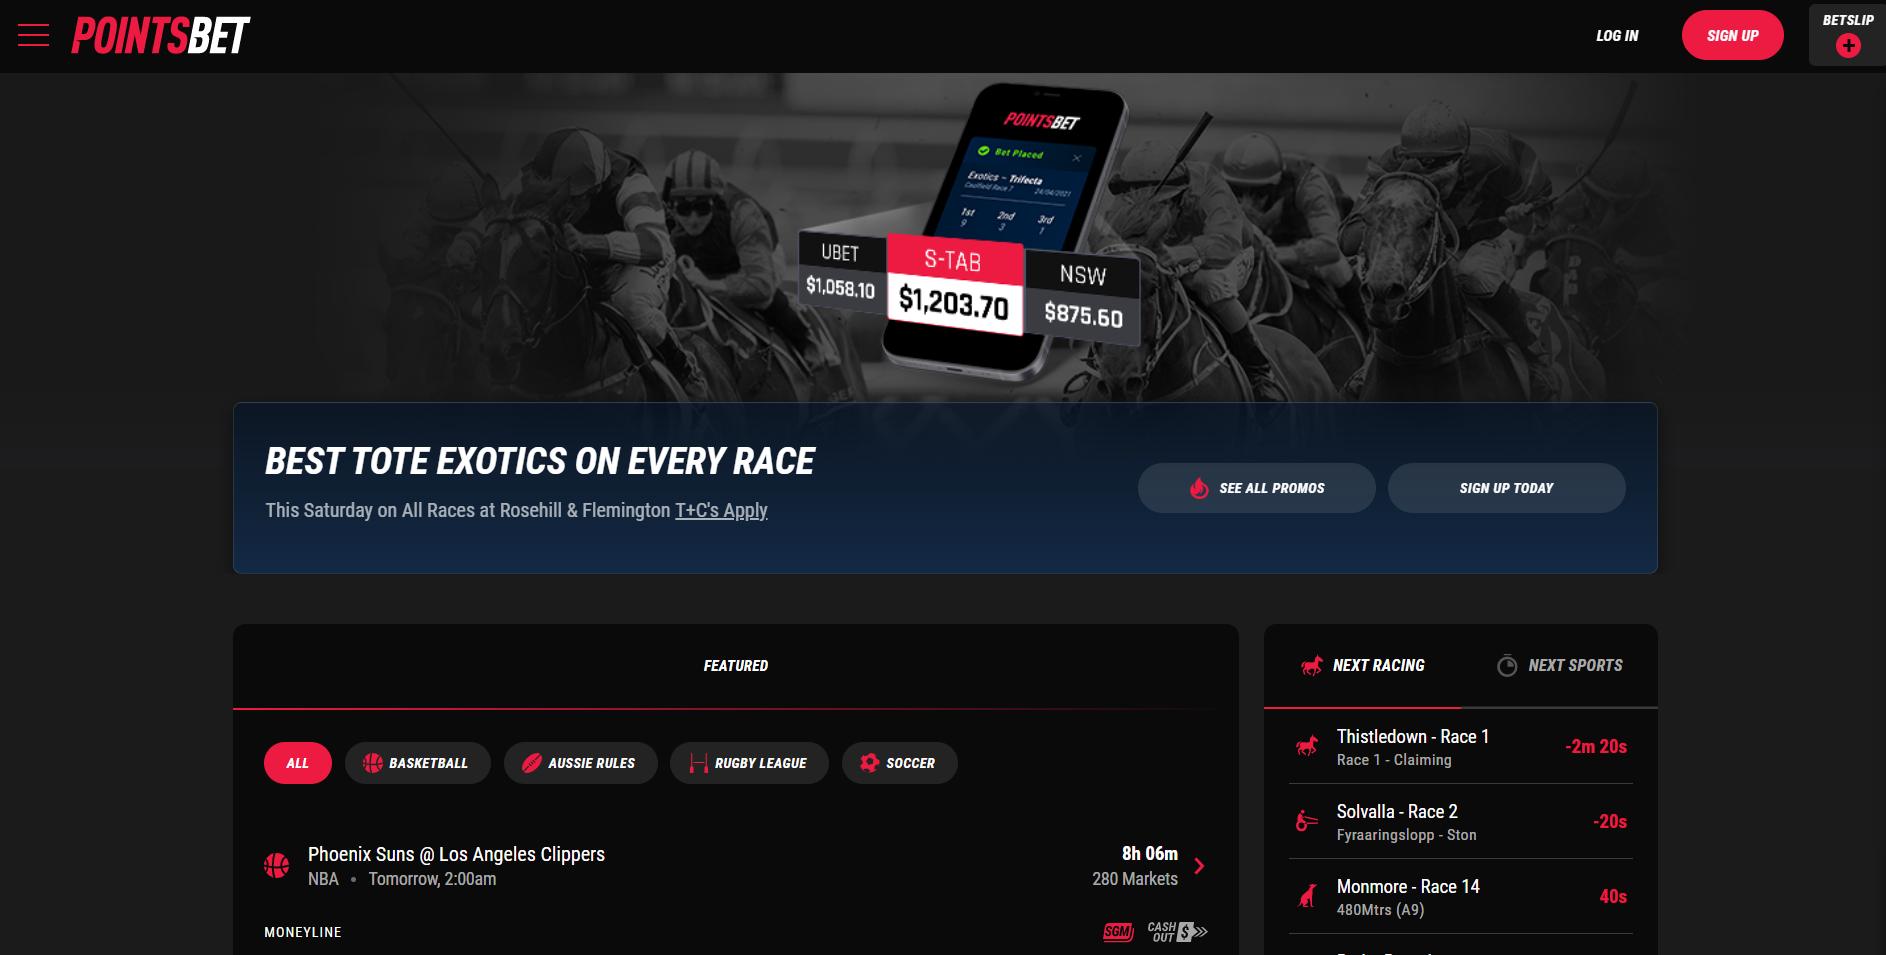 live betting Australia - pointsbet